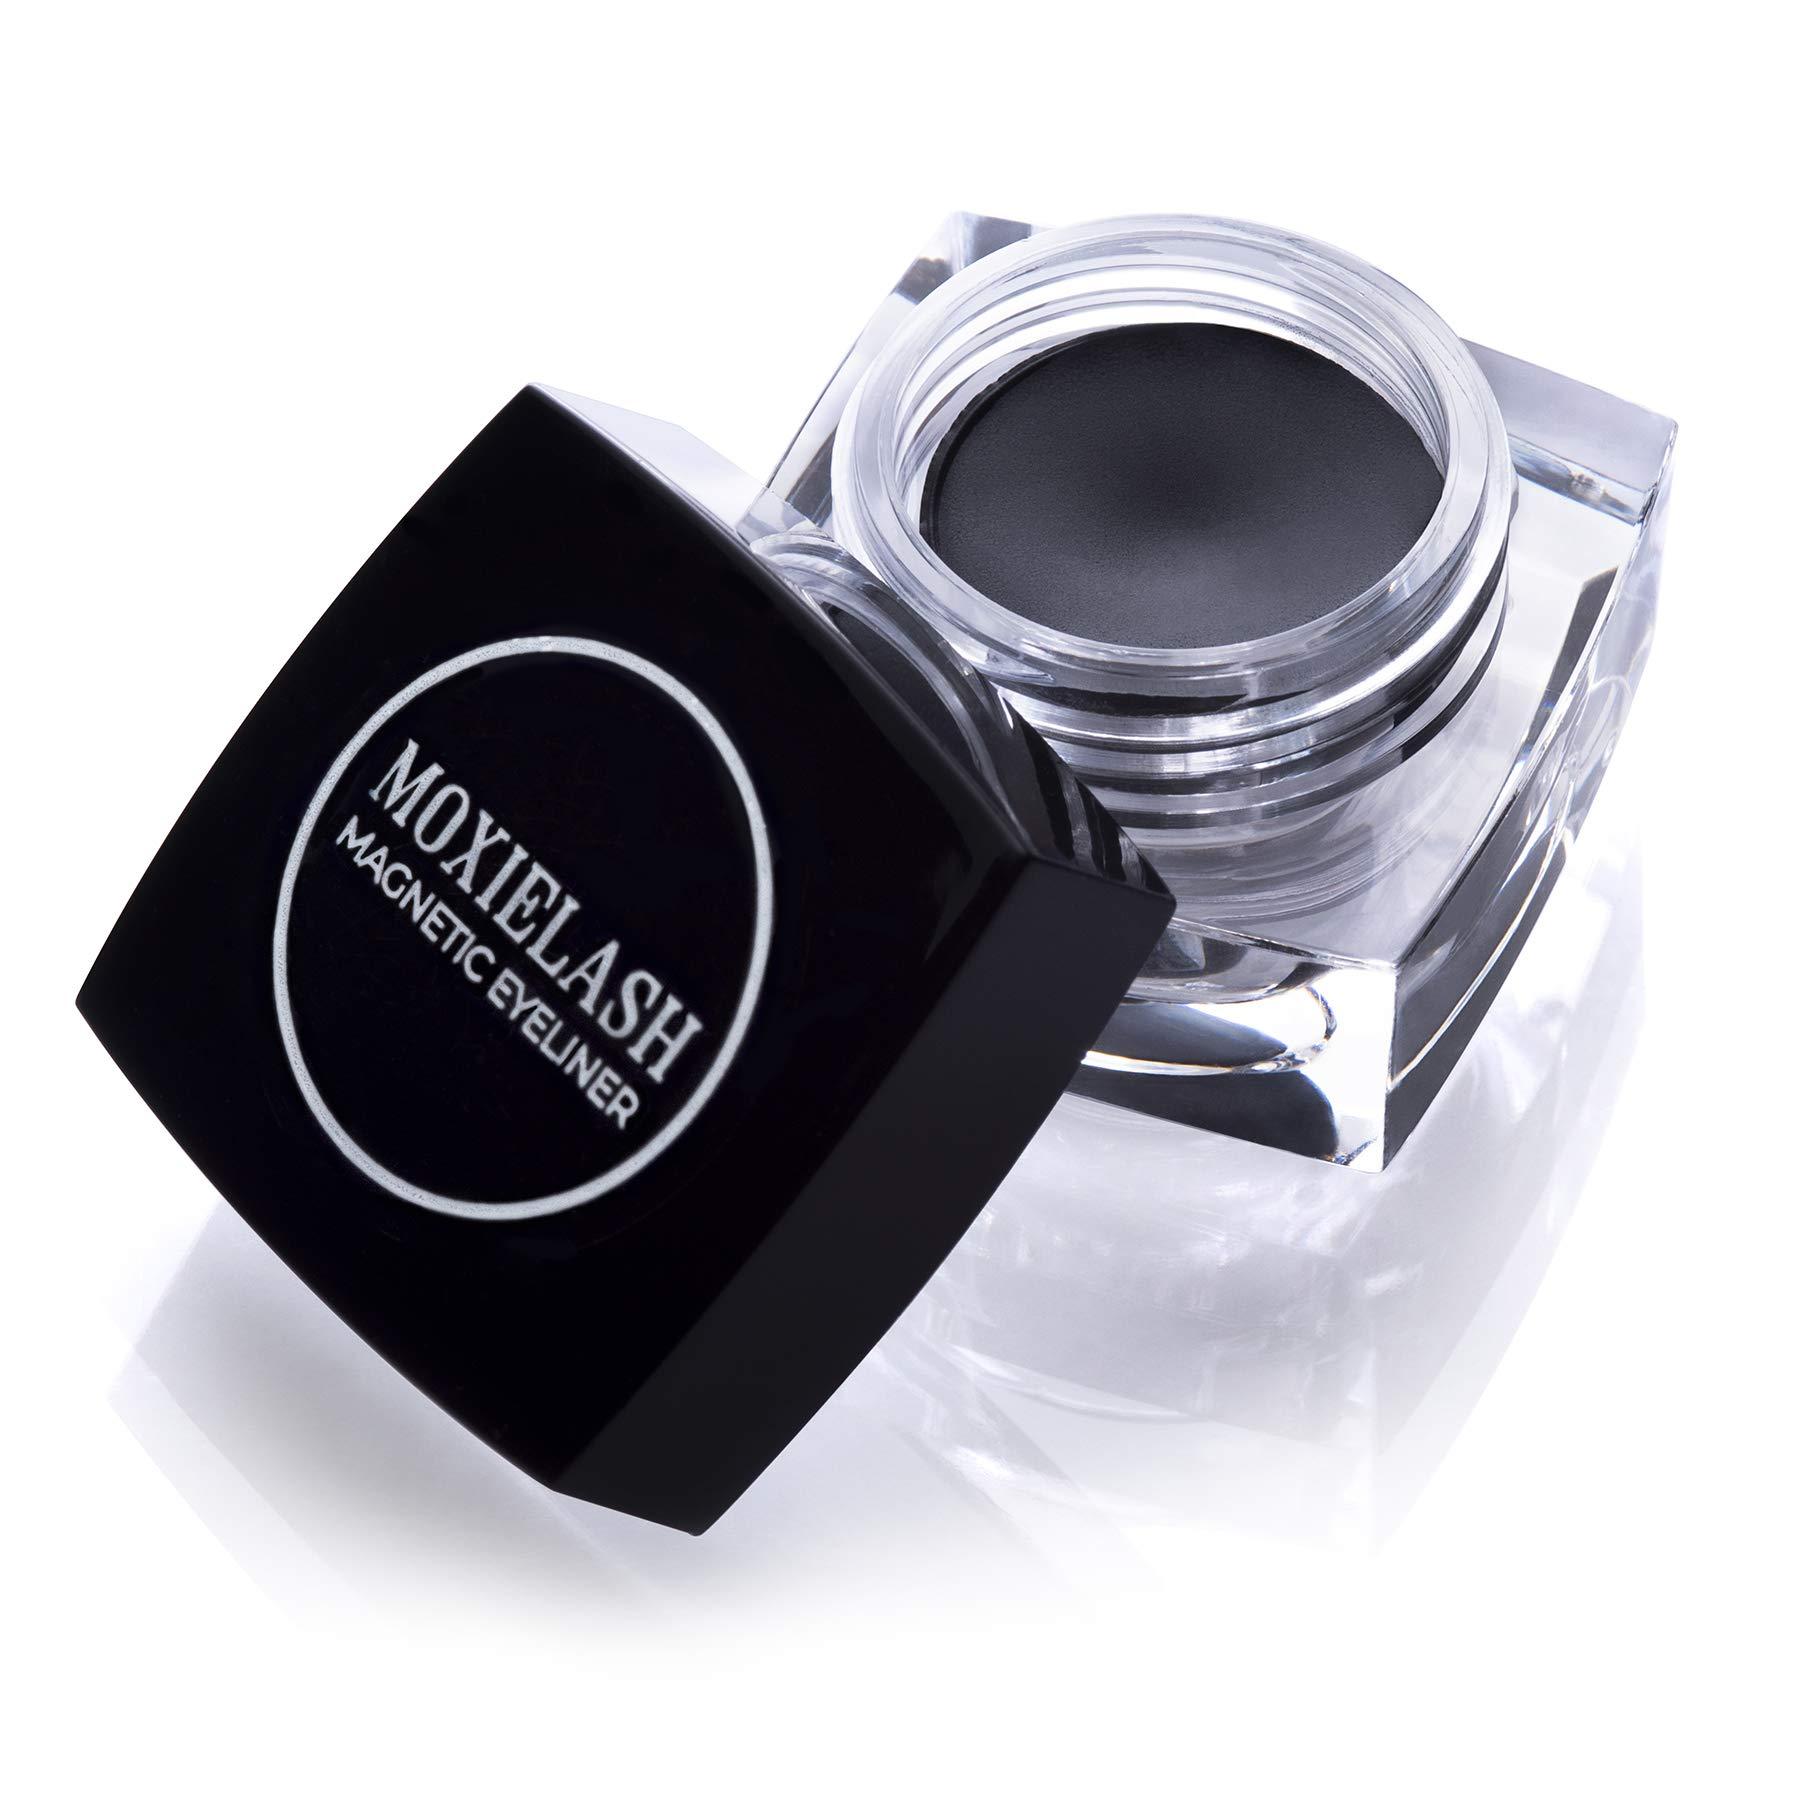 MoxieLash Magnetic Gel Eyeliner for Magnetic Eyelashes - No Glue & Mess Free - Fast & Easy Application